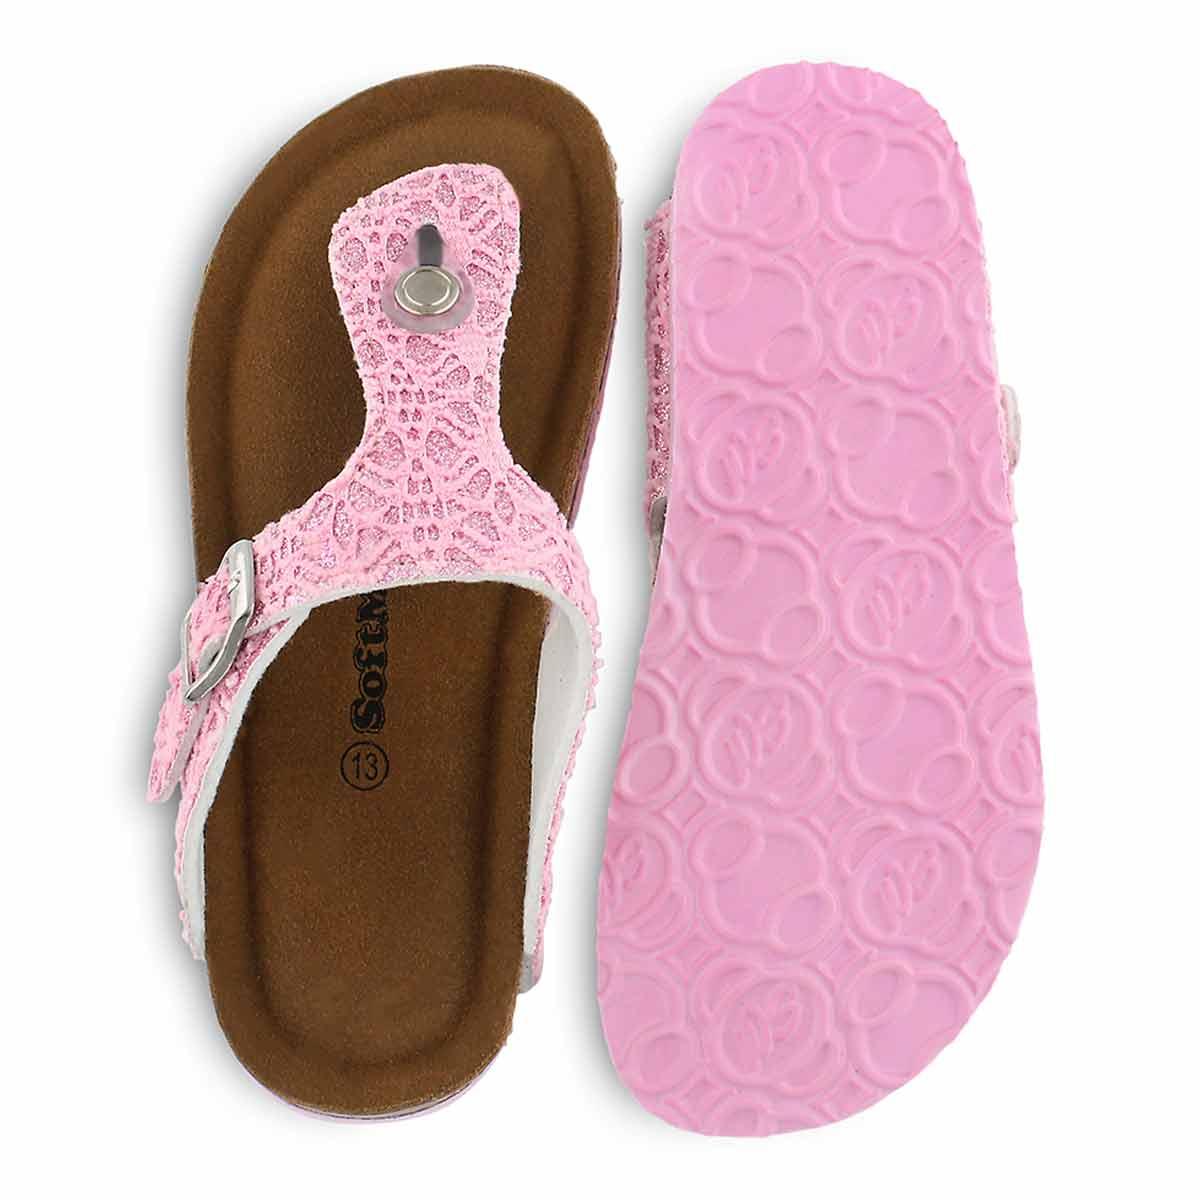 Grls Angy 6 Fab pink mem foam thng sndl